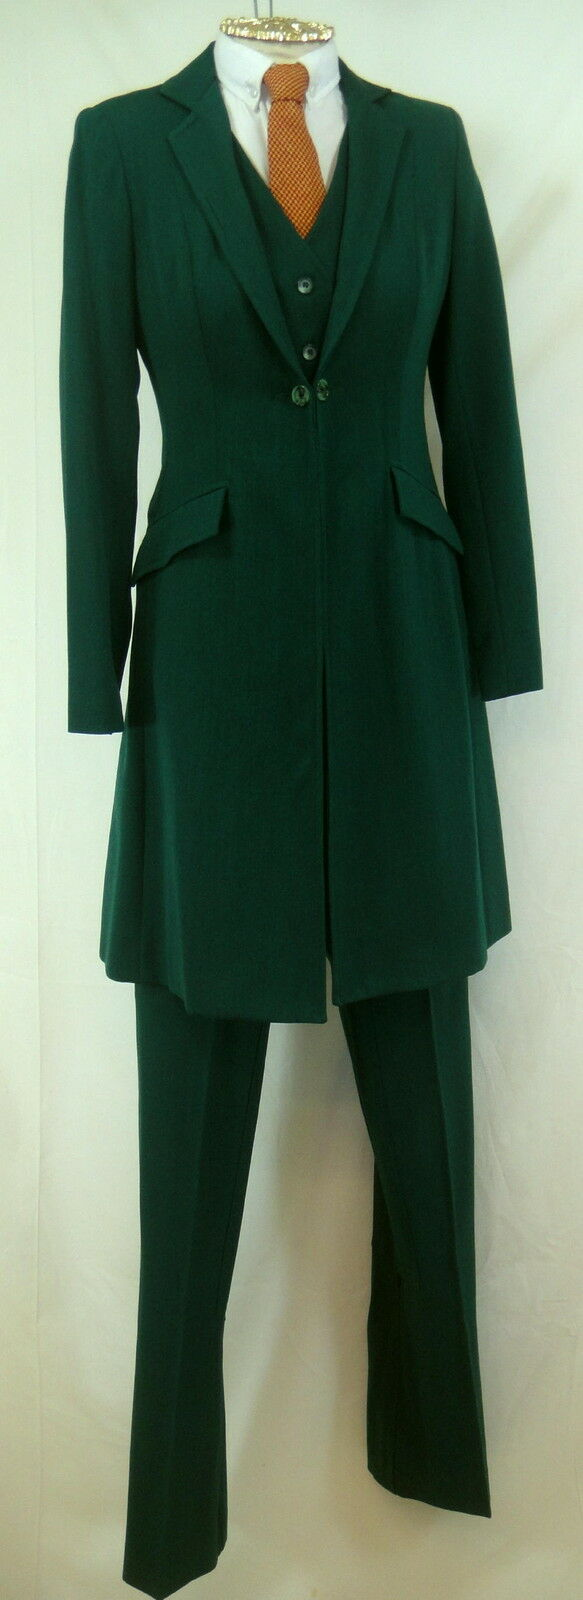 Reed Hill Saddleseat Ld 3p suit Hunter Herringbone Wool  Blend s8